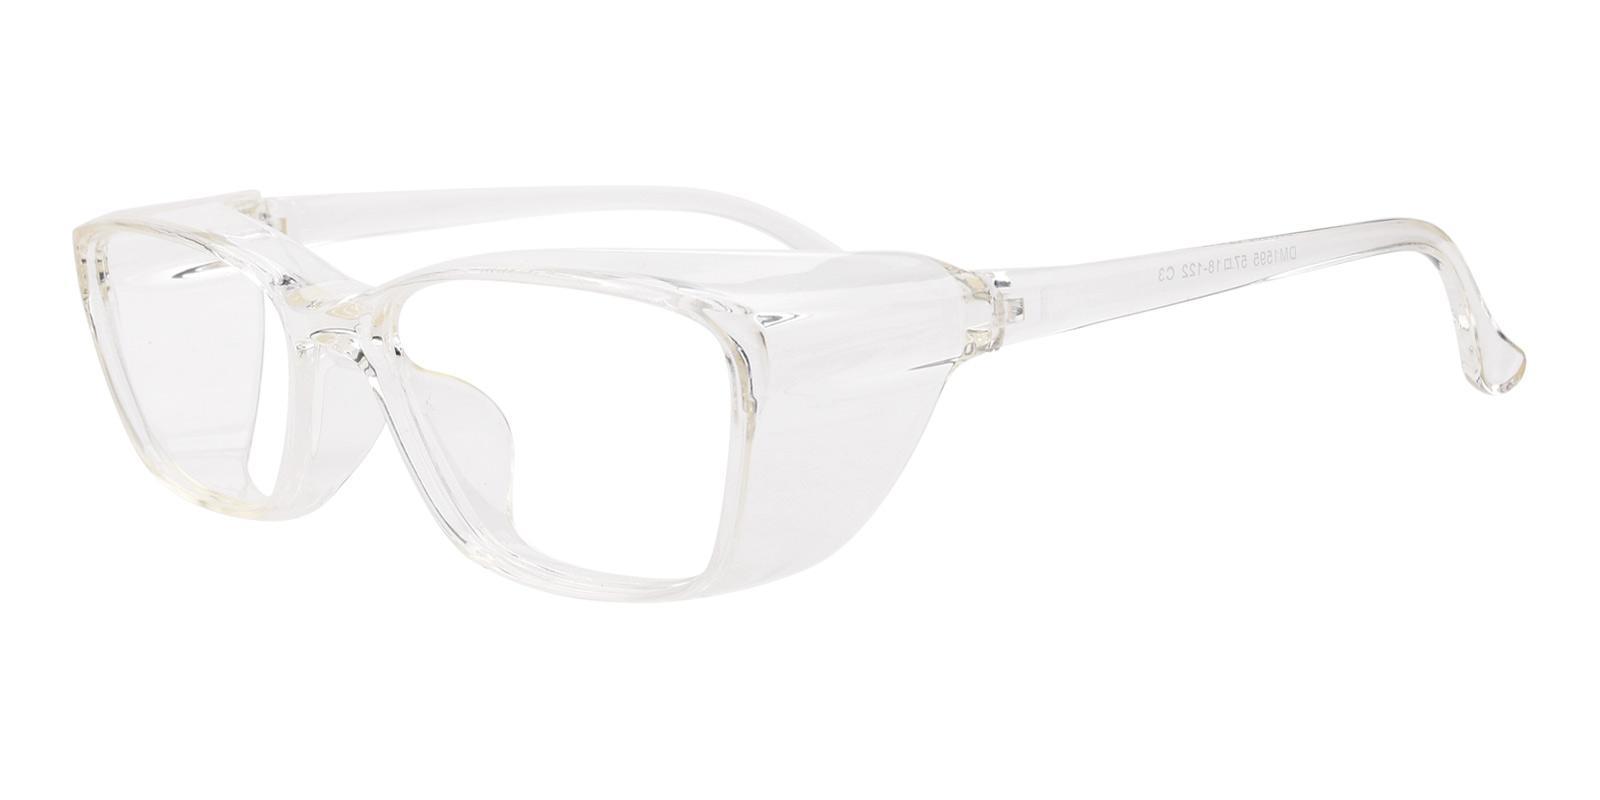 Protective Glasses-Translucent-Rectangle-TR-Eyeglasses-detail